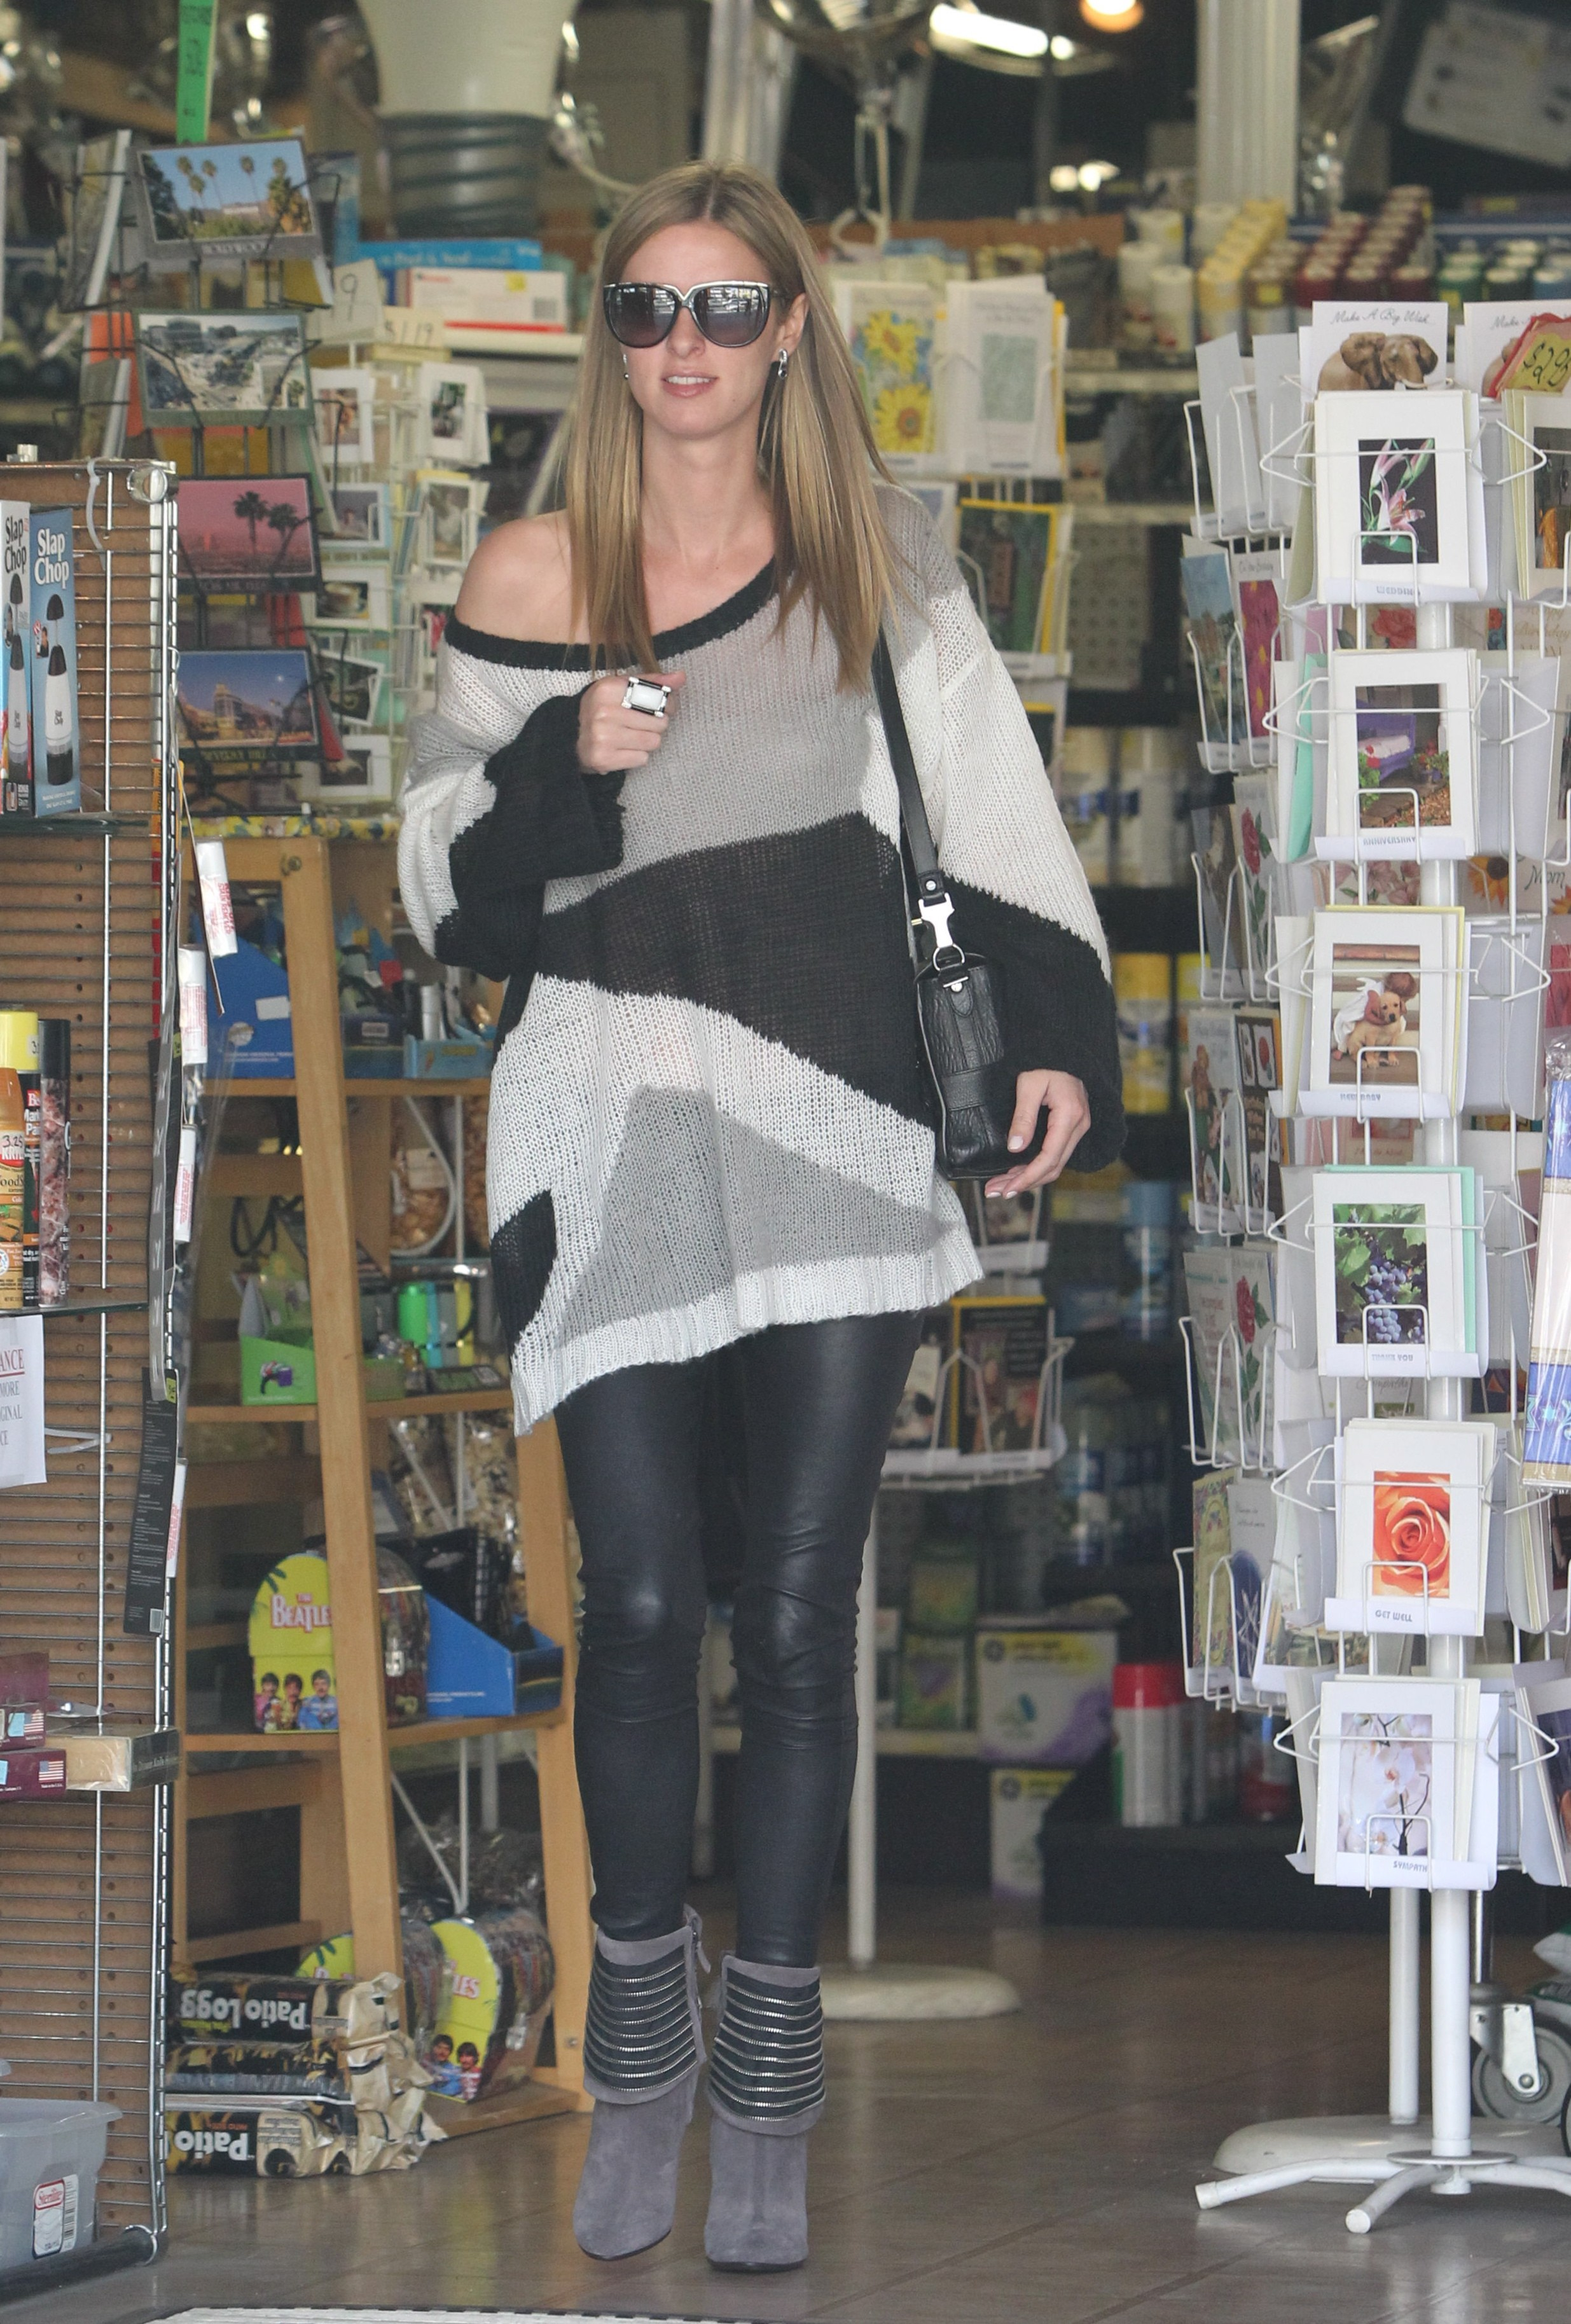 04858_celebrity_paradise.com_TheElder_NickyHilton2012_03_14_shoppinginBeverlyHills4_122_596lo.jpg